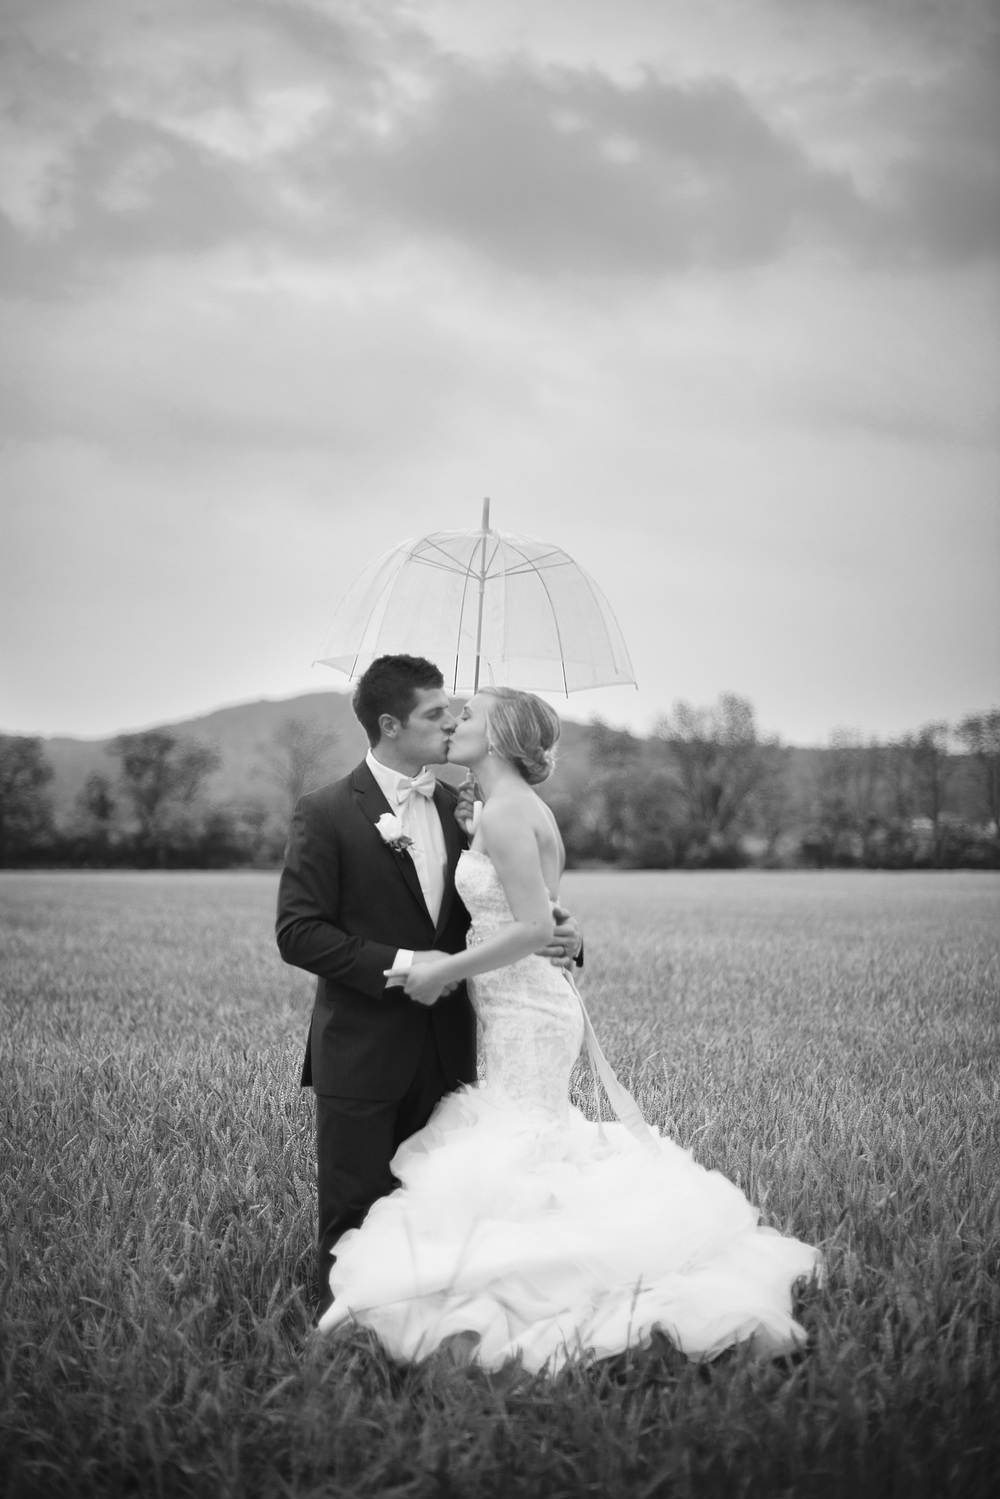 wedding open field bride groom bw umbrella rain couple husband wife portrait THPHOTO